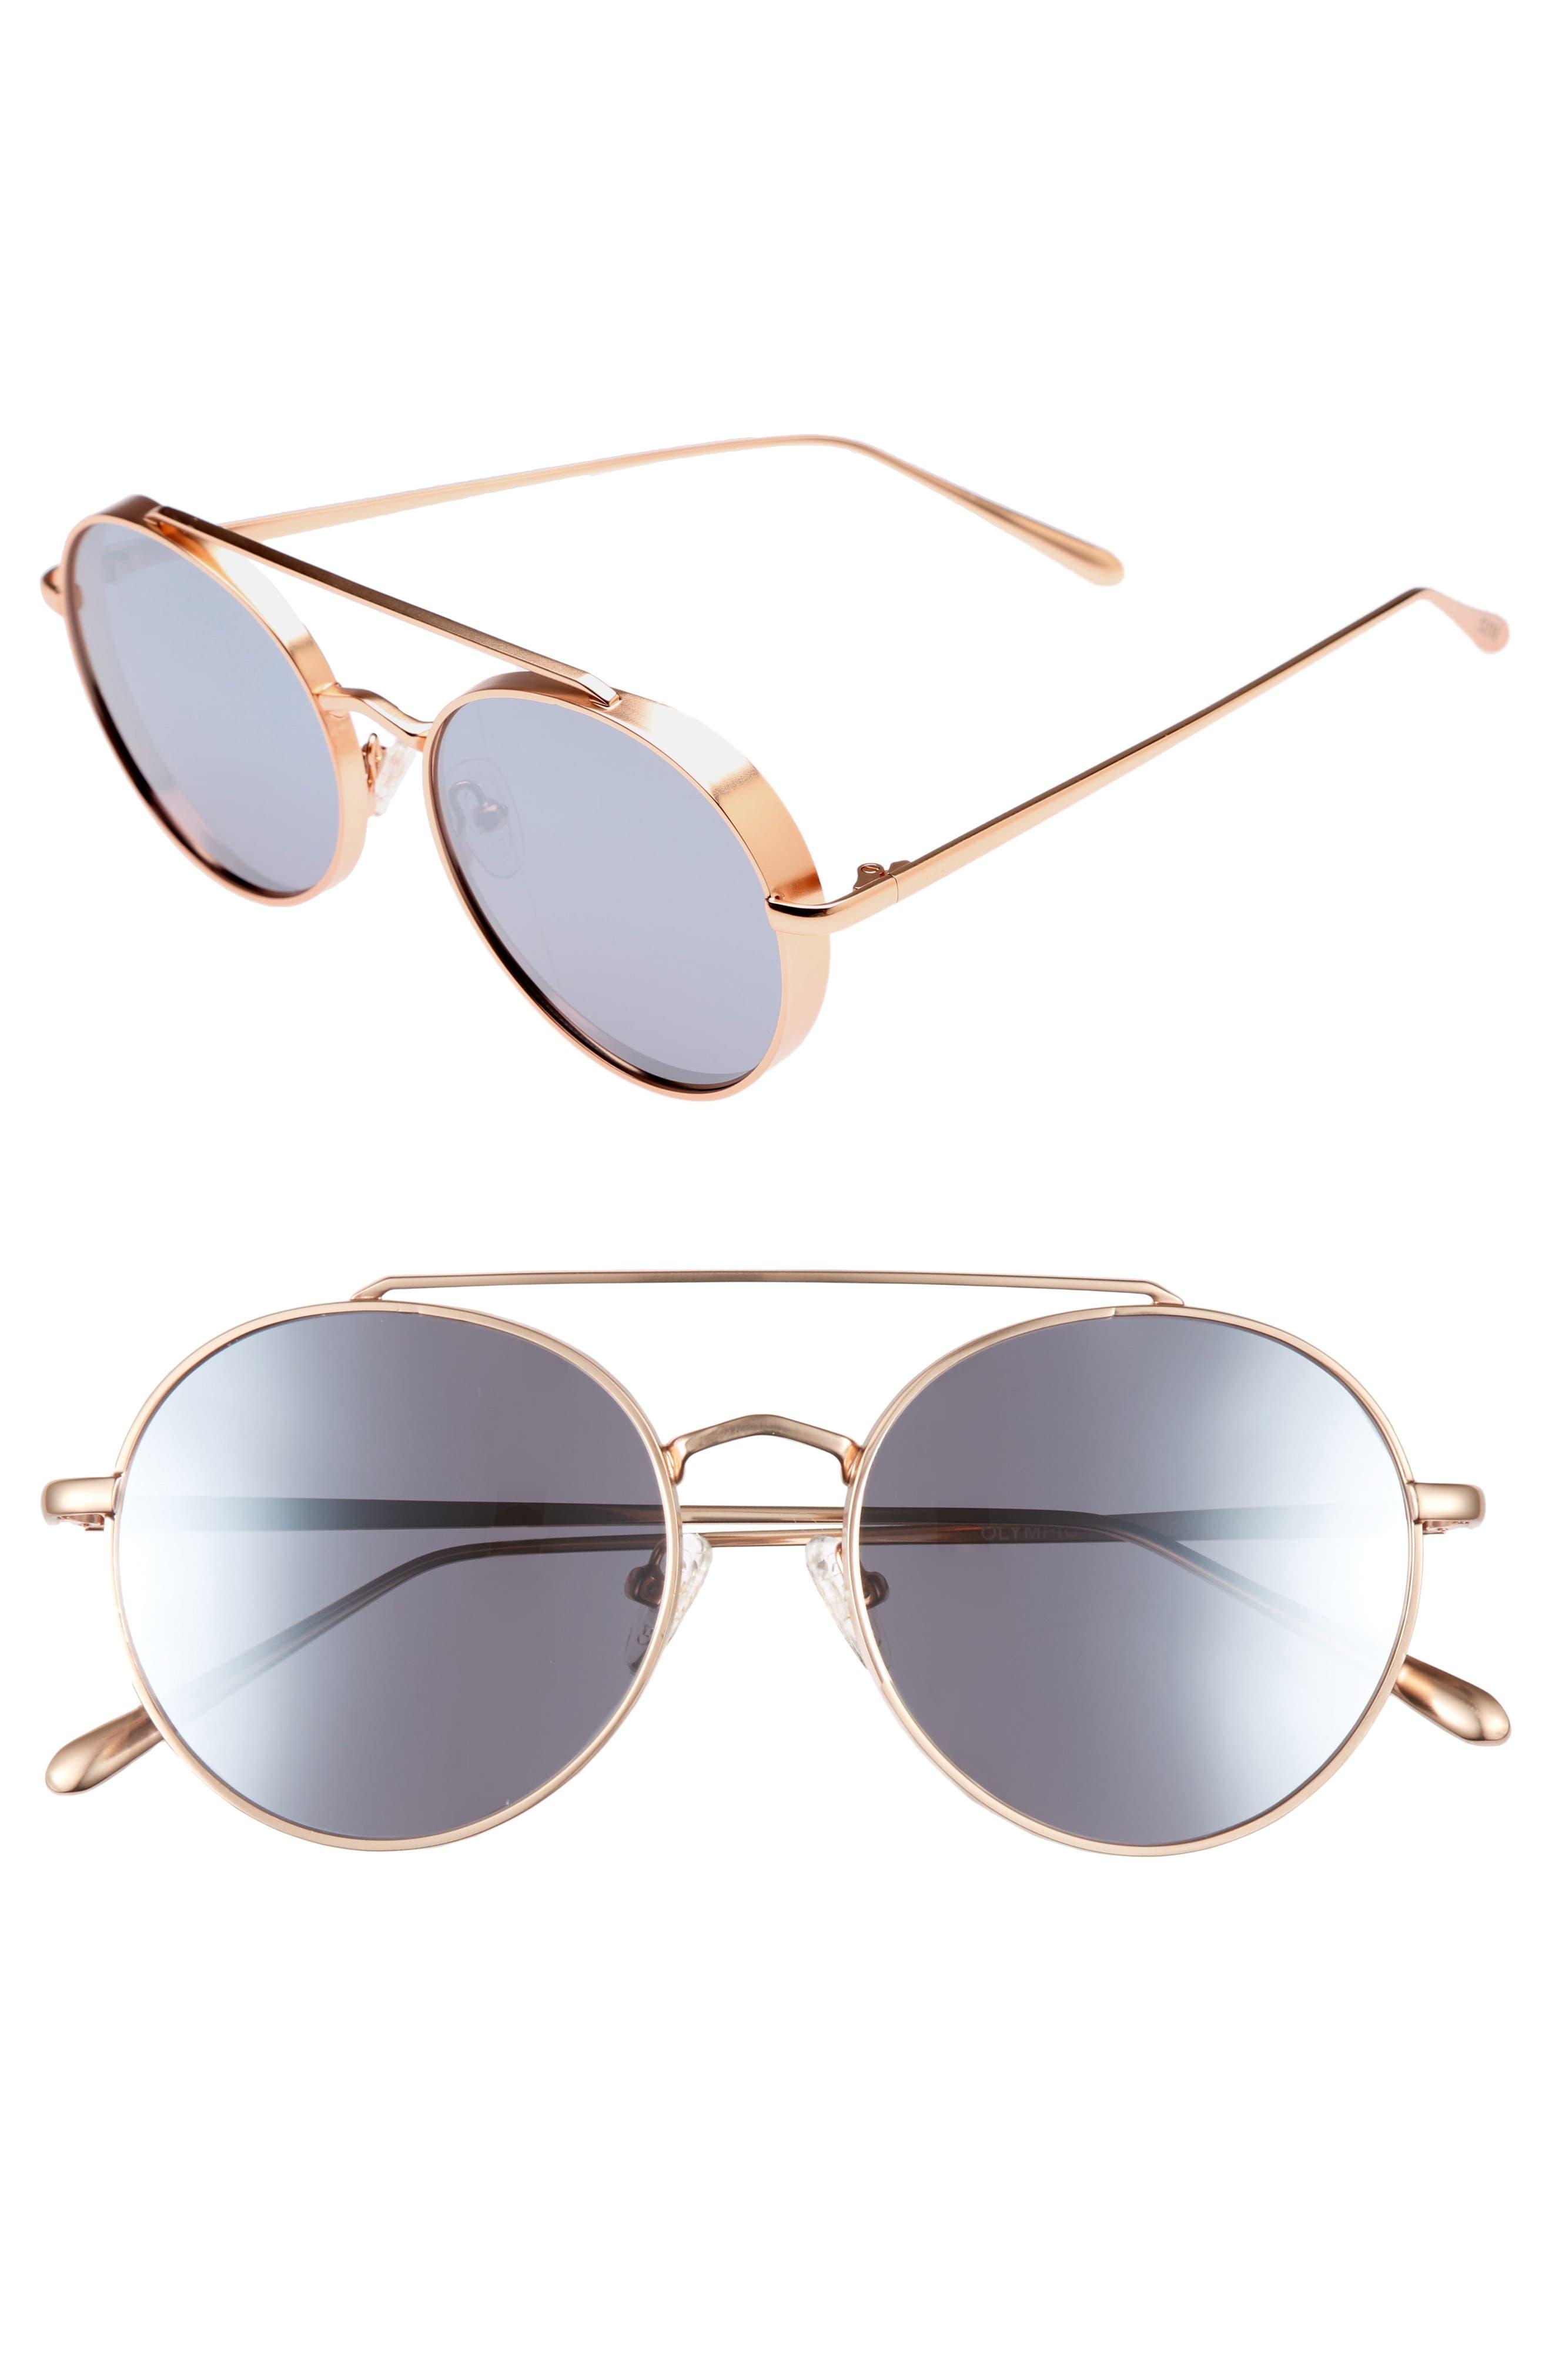 Olympic 53mm Polarized Aviator Sunglasses,                             Main thumbnail 1, color,                             Silver